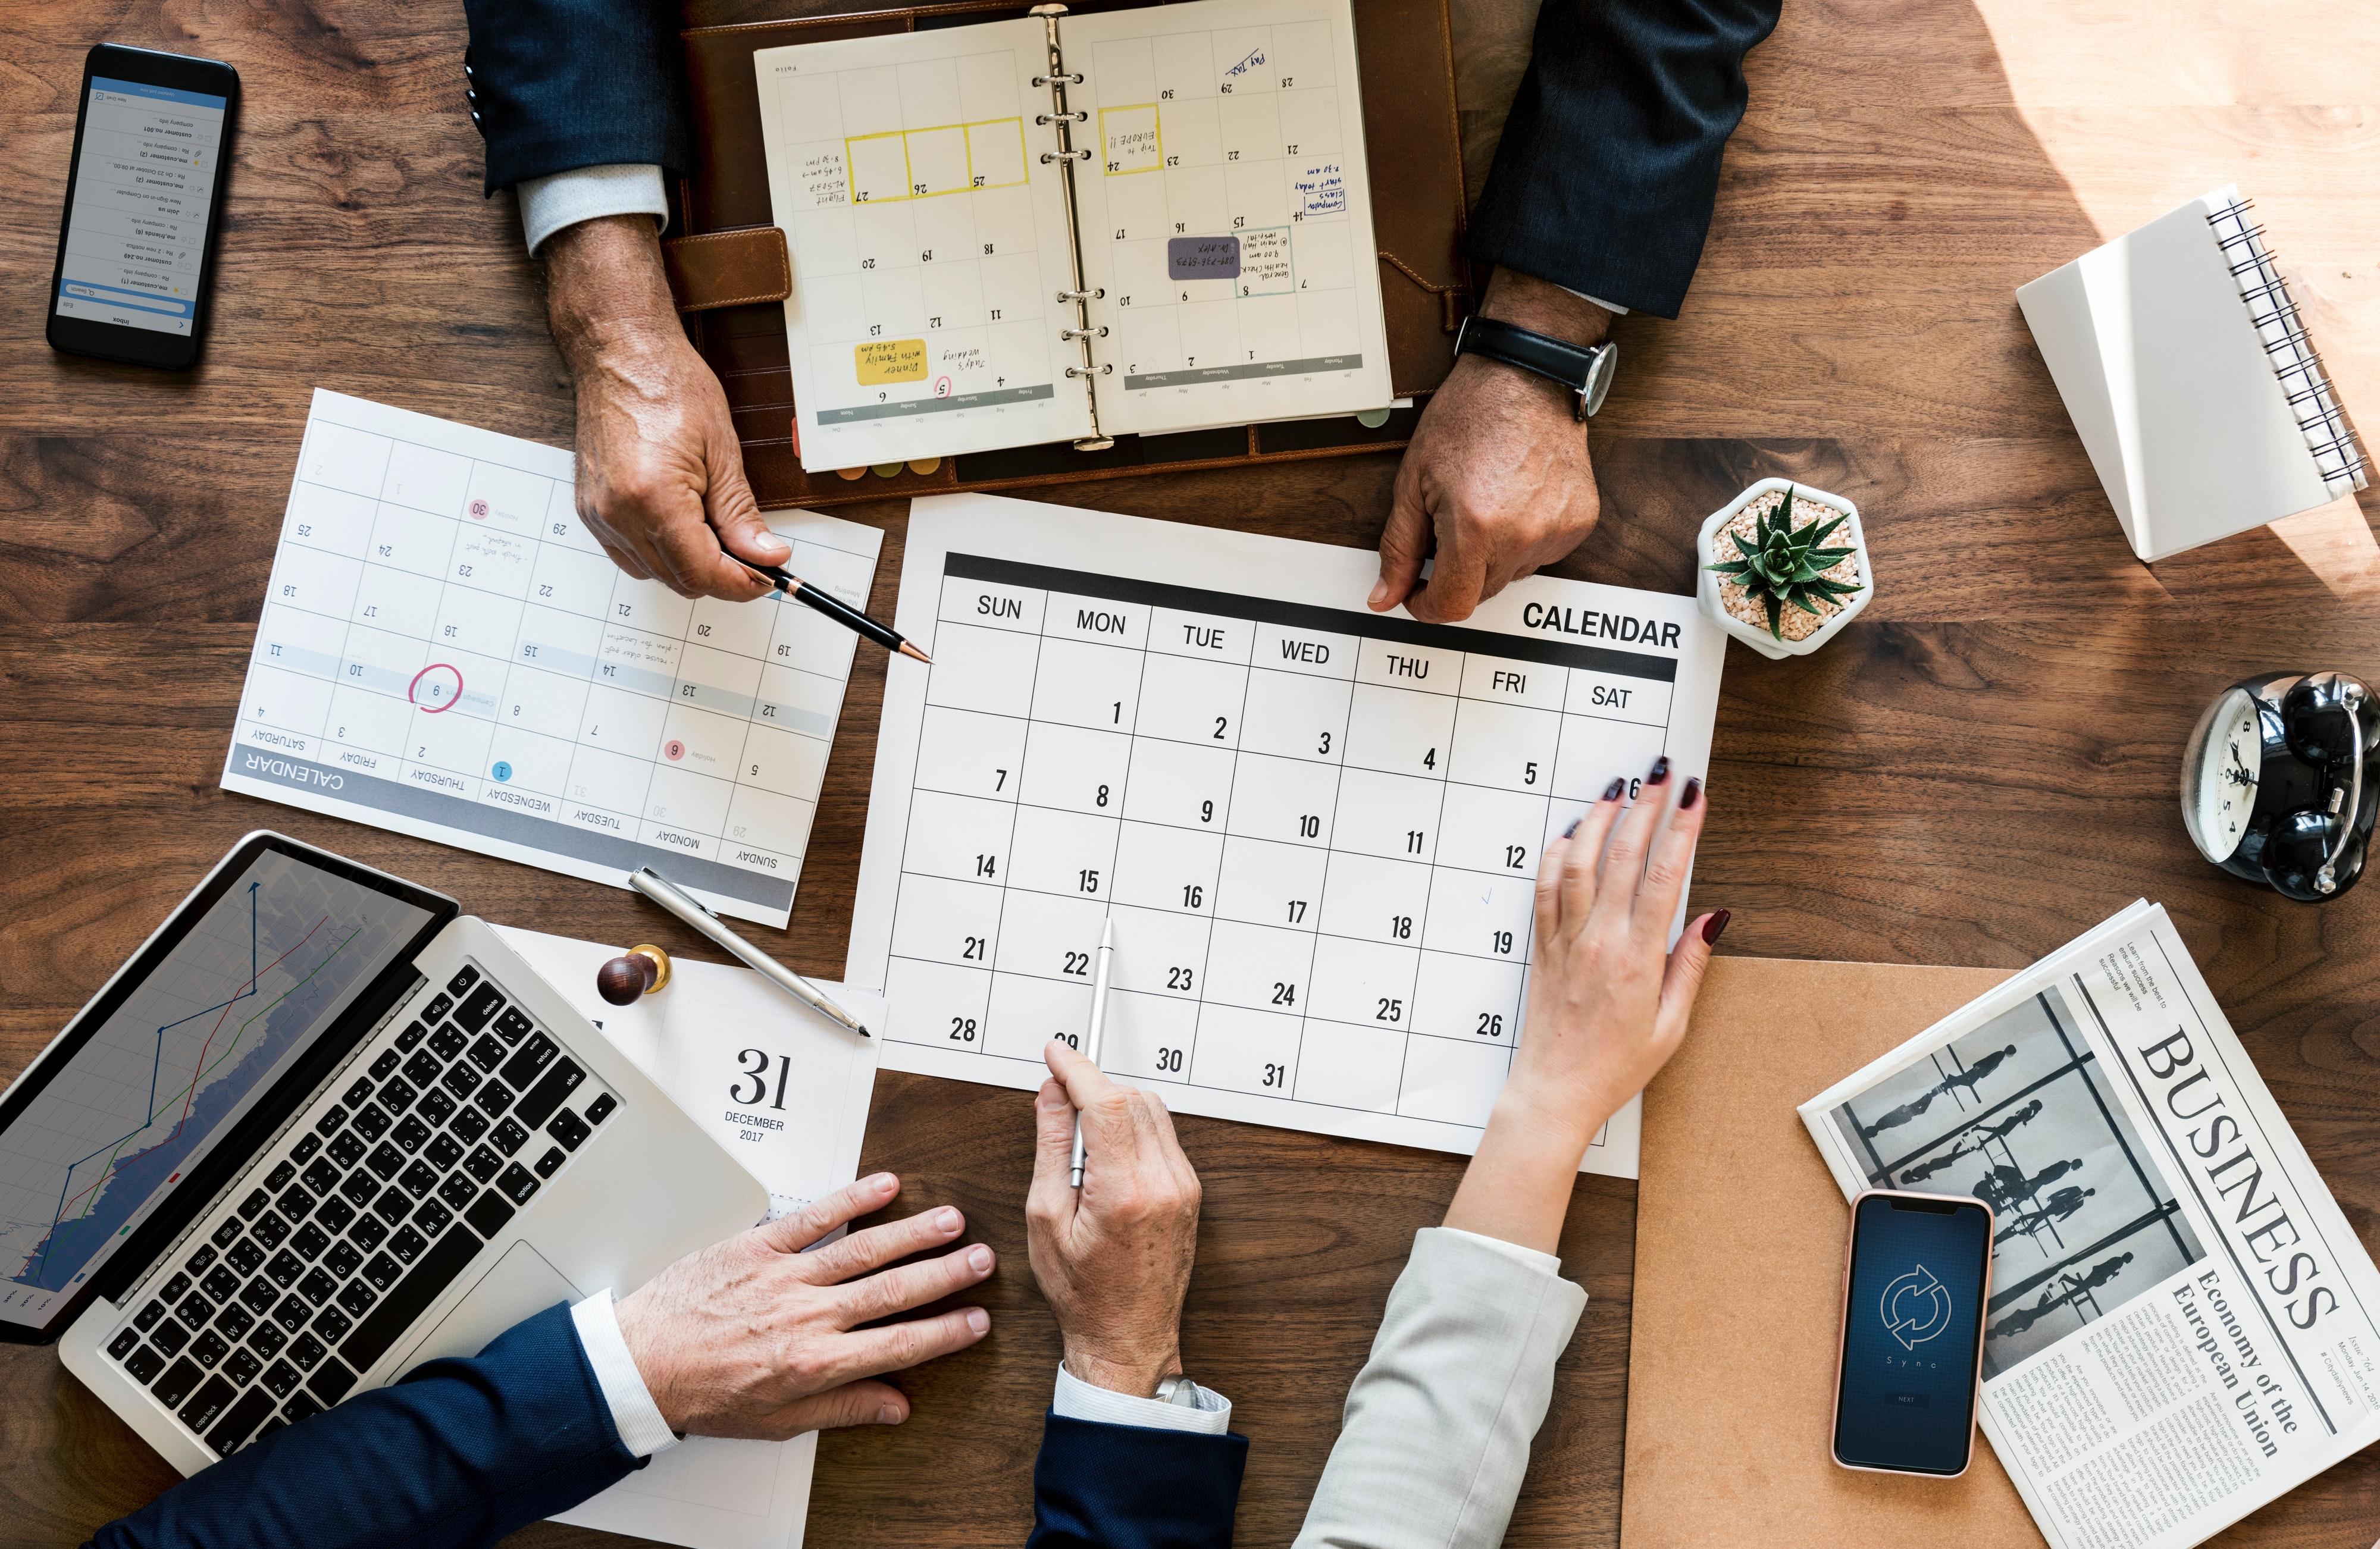 business-business-people-calendar-1187439.jpg